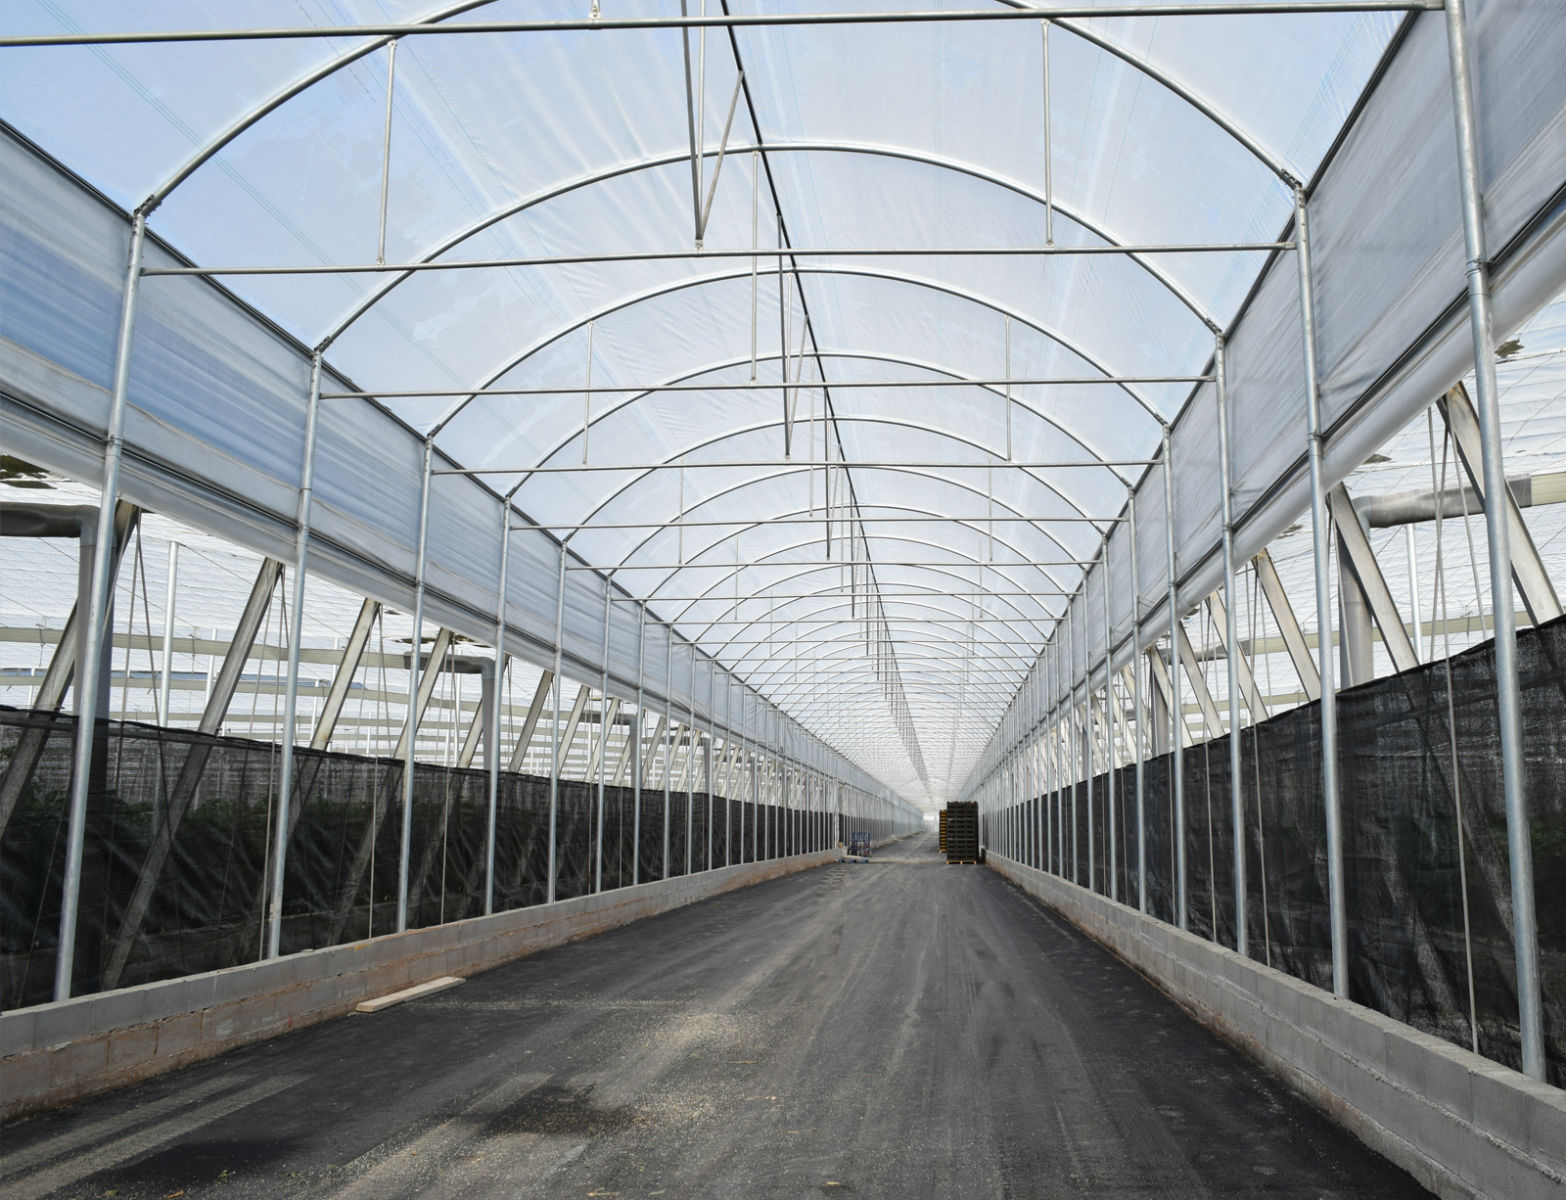 Dise o de invernaderos construccion de invernaderos almeria Diseno de invernaderos pdf